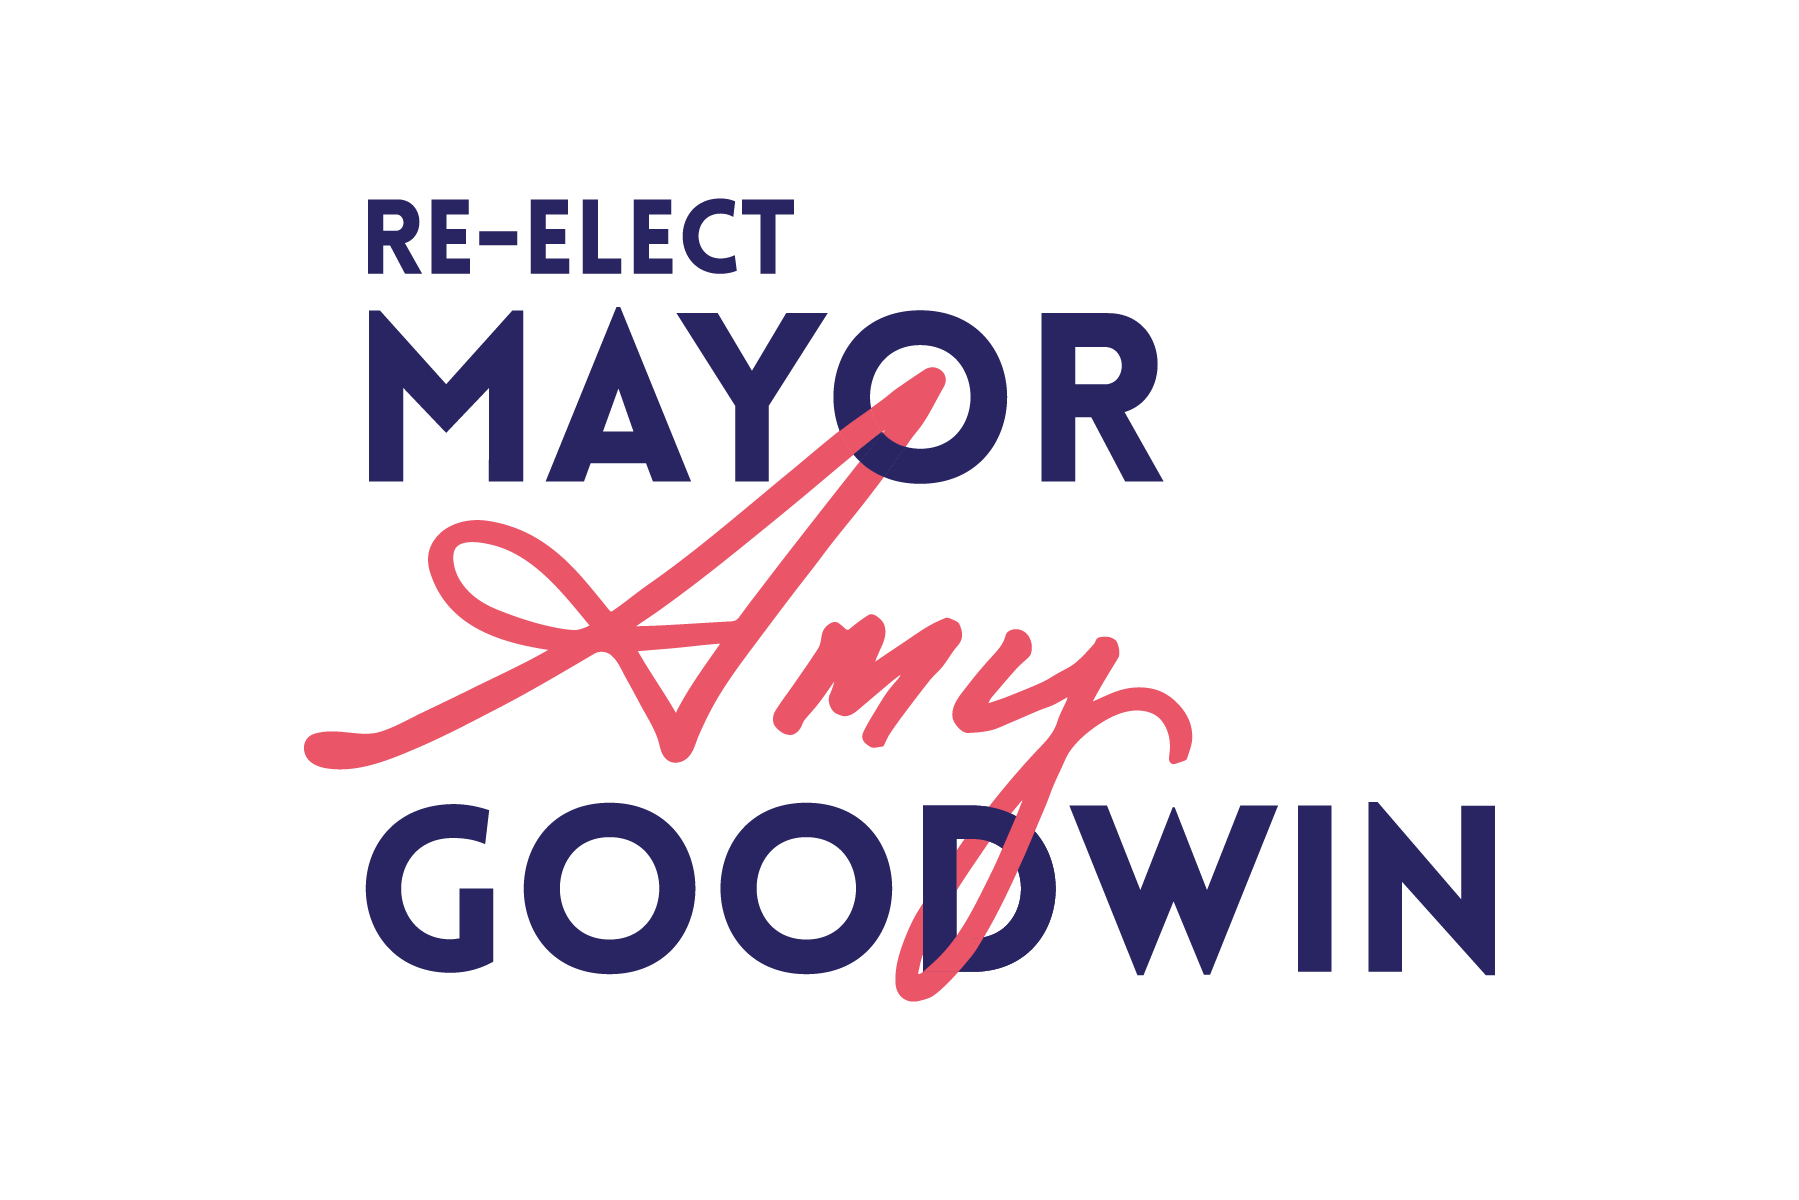 Goodwin for Charleston